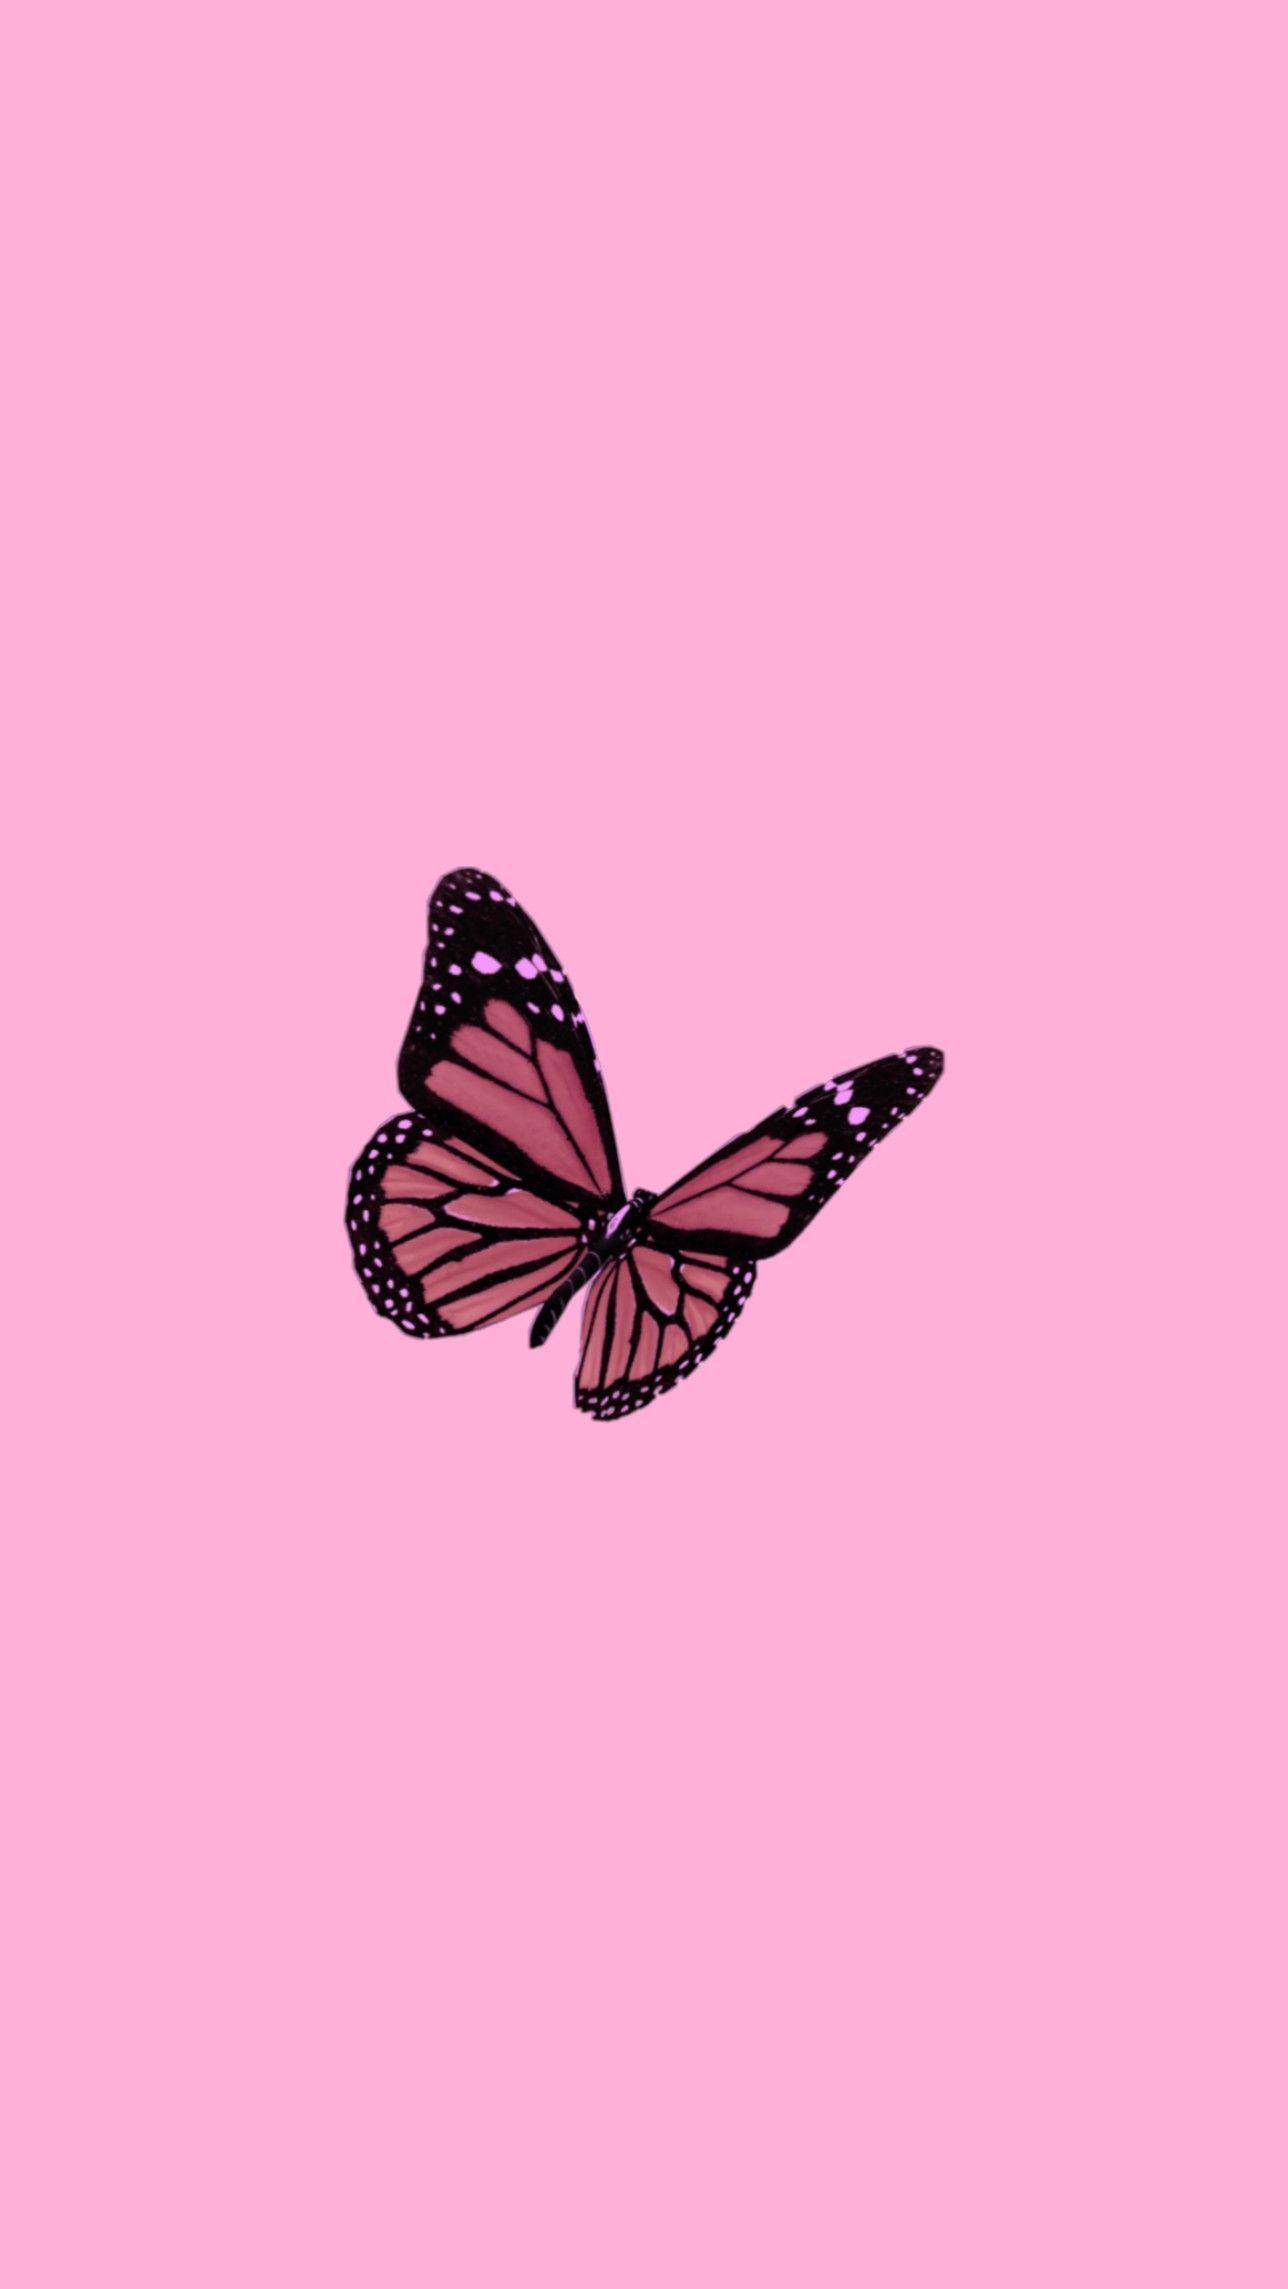 Vsco Butterfly Wallpapers Top Free Vsco Butterfly Backgrounds